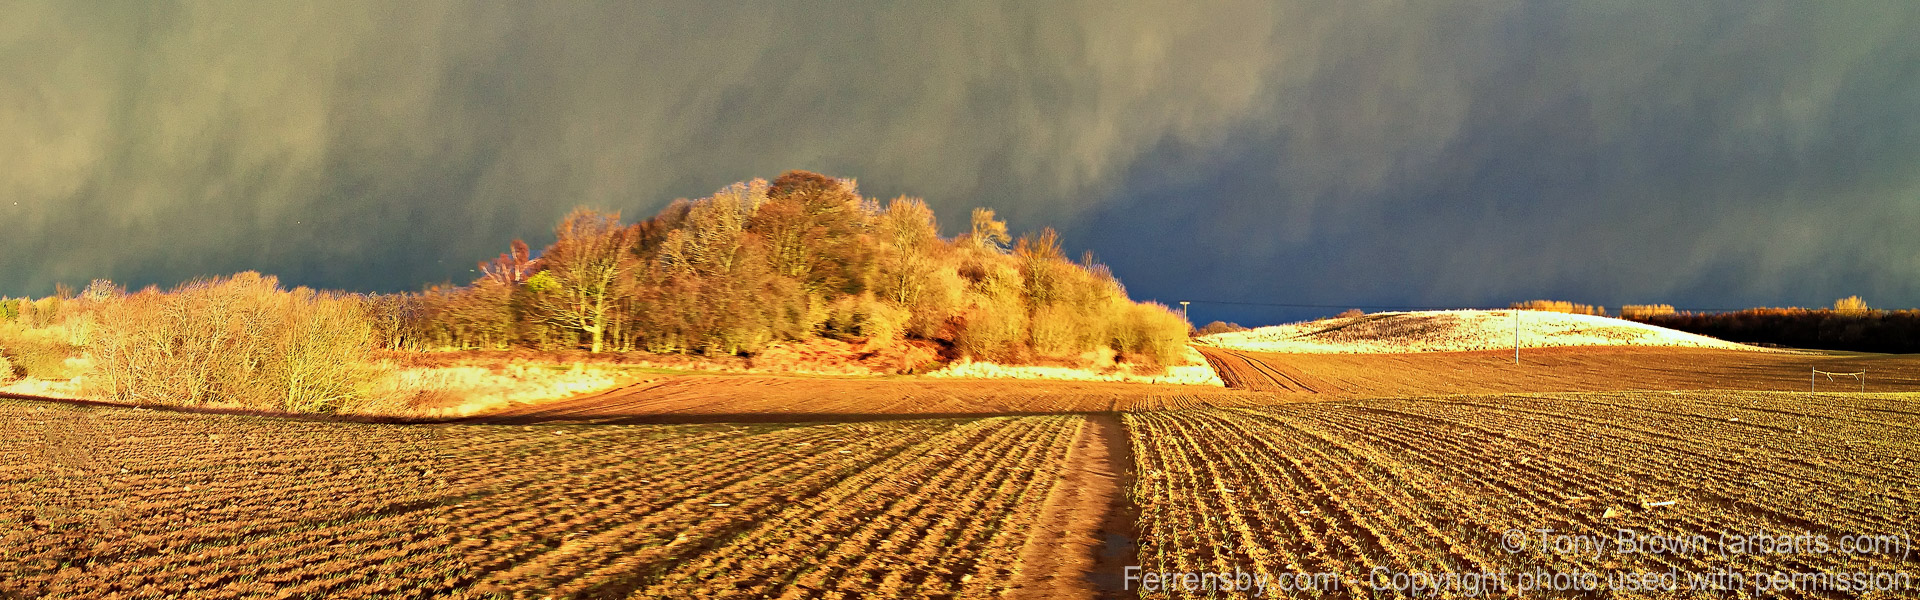 ferrensby_dawn-tony_brown